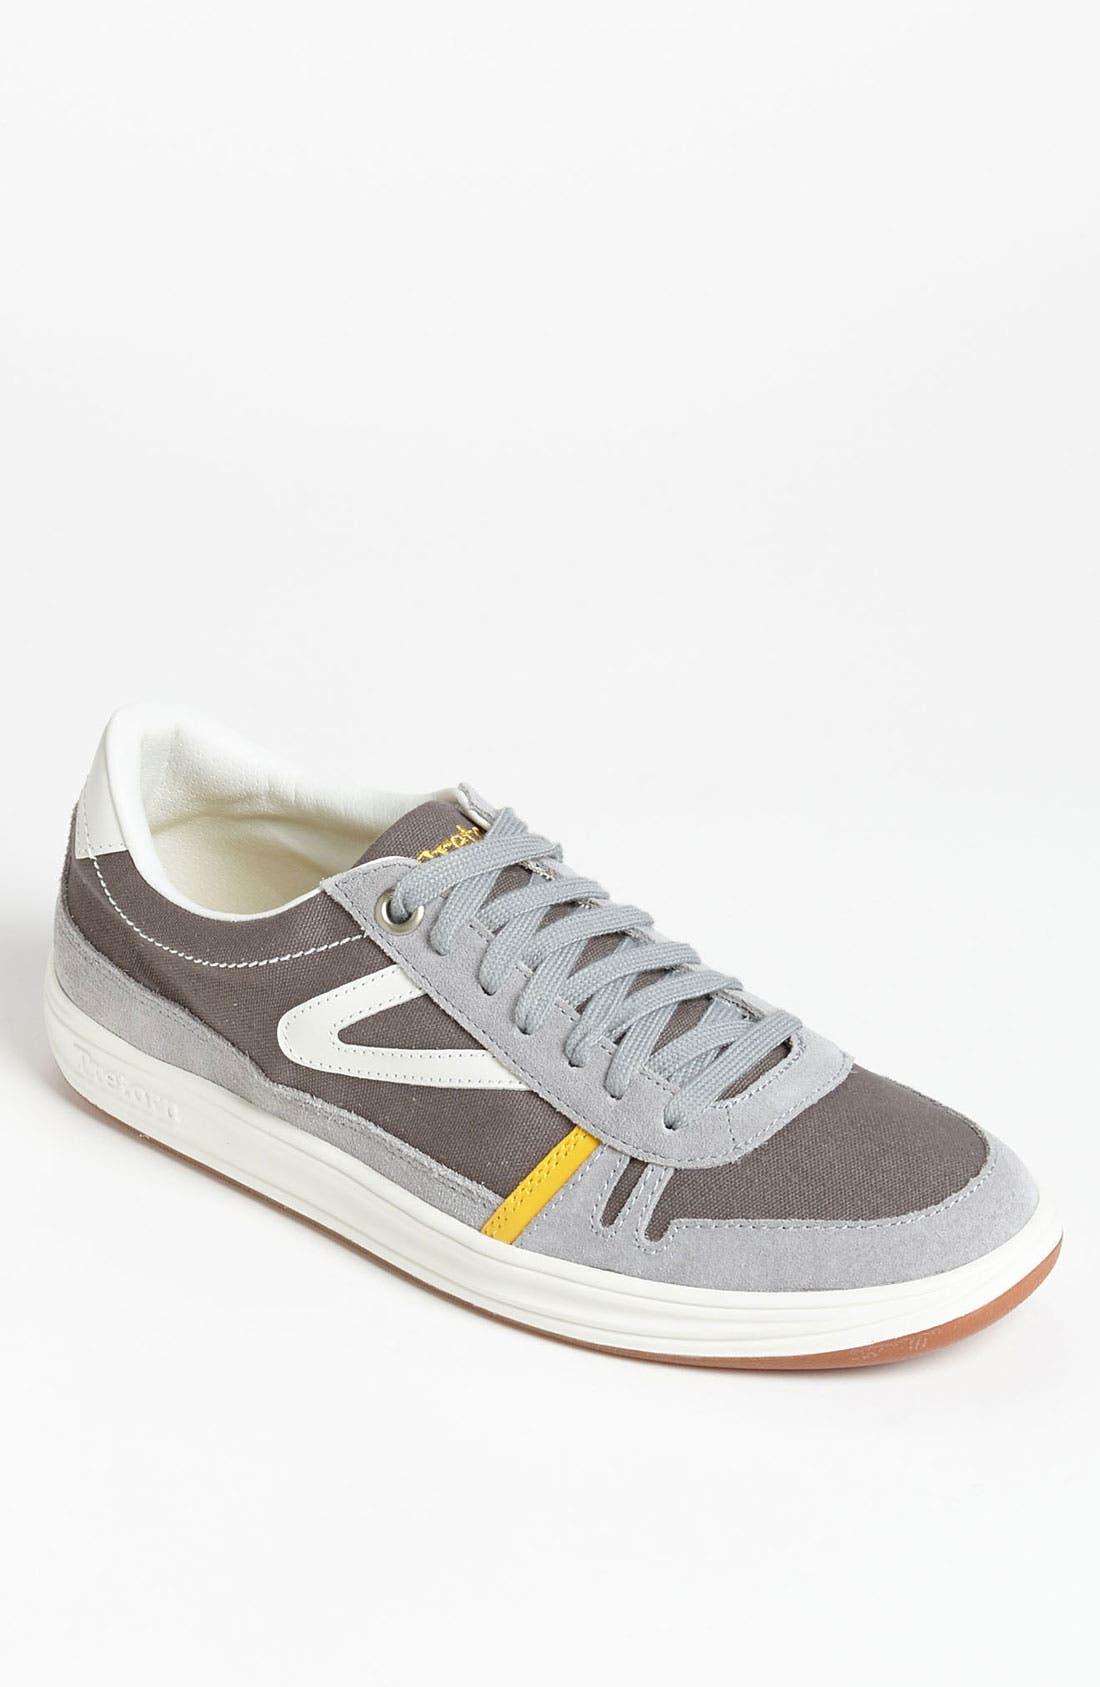 Main Image - Tretorn 'Rodlera' Sneaker (Men)